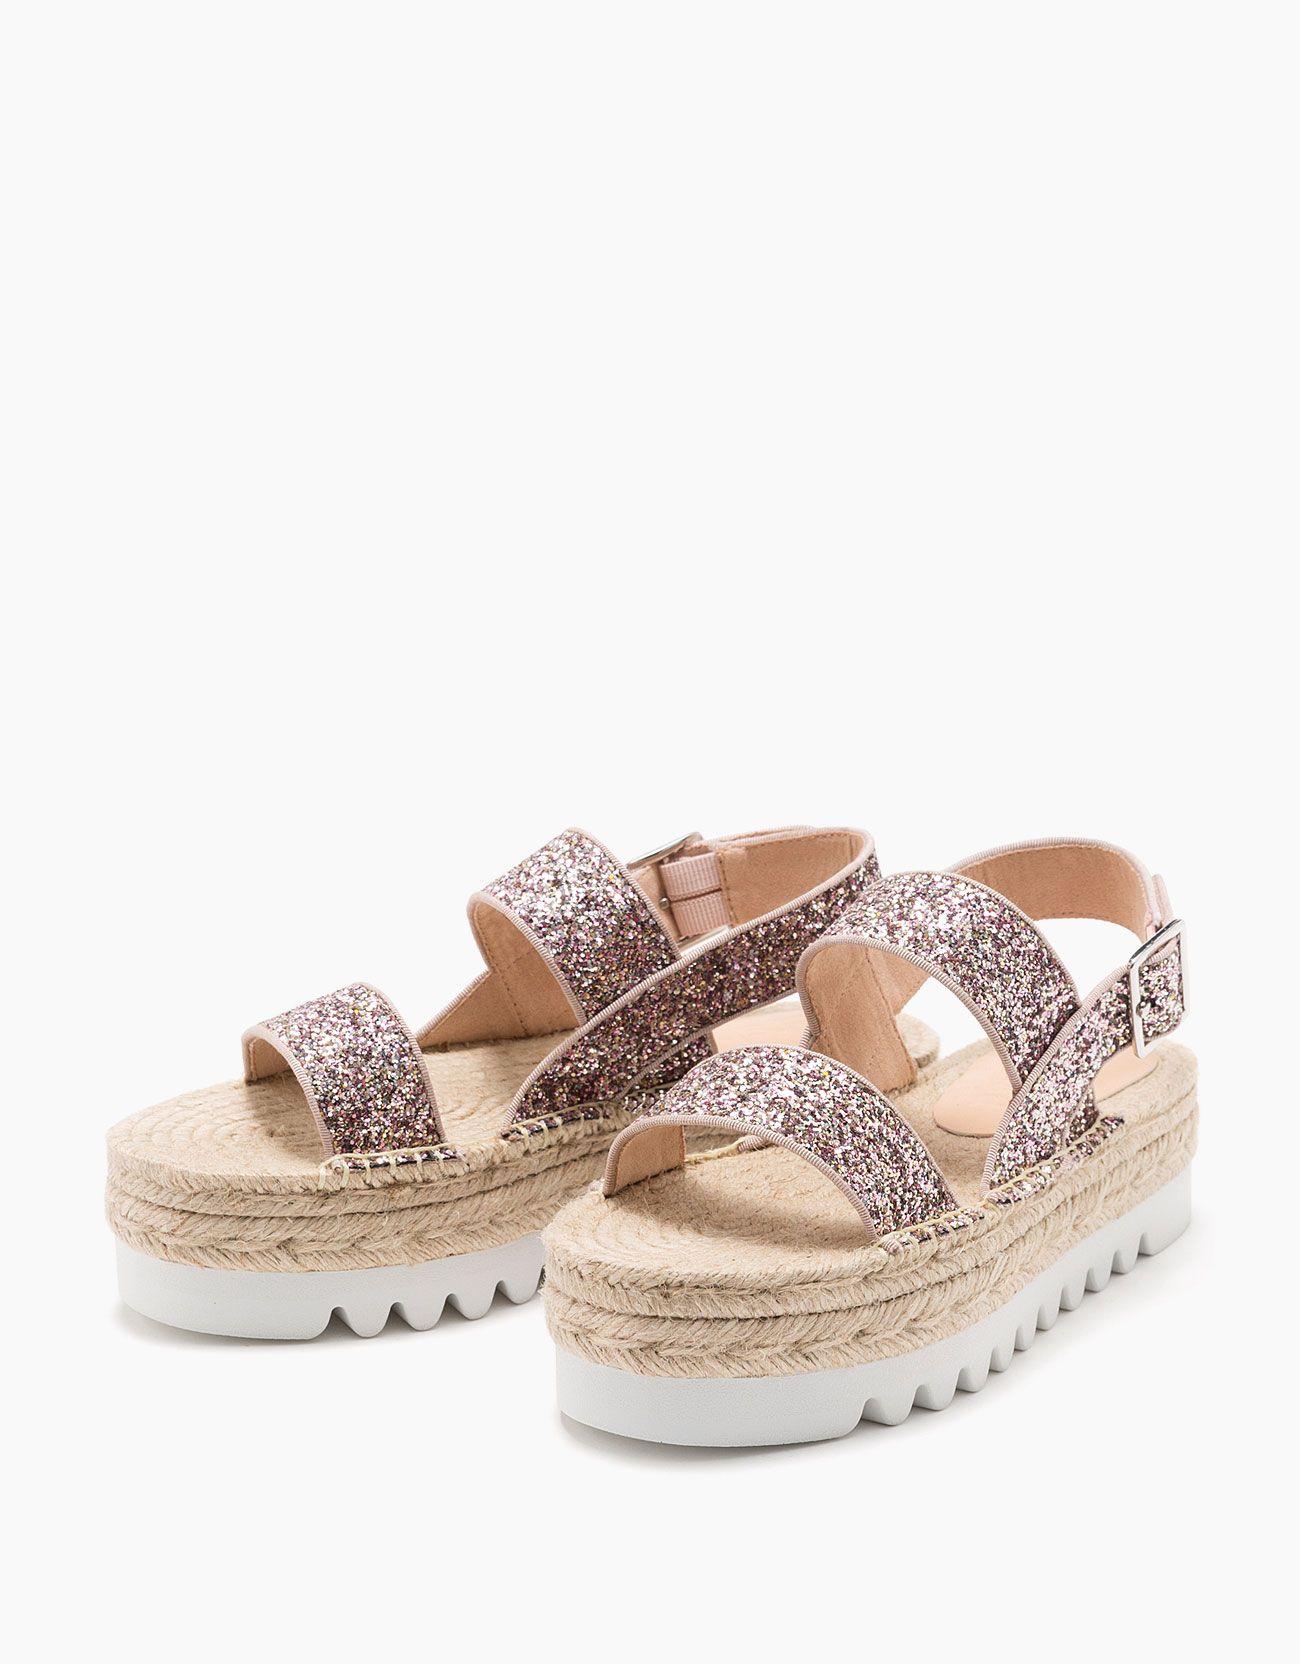 1da31c2f Sandalia plataforma yute de purpurina | Shoes... | Plataformas ...